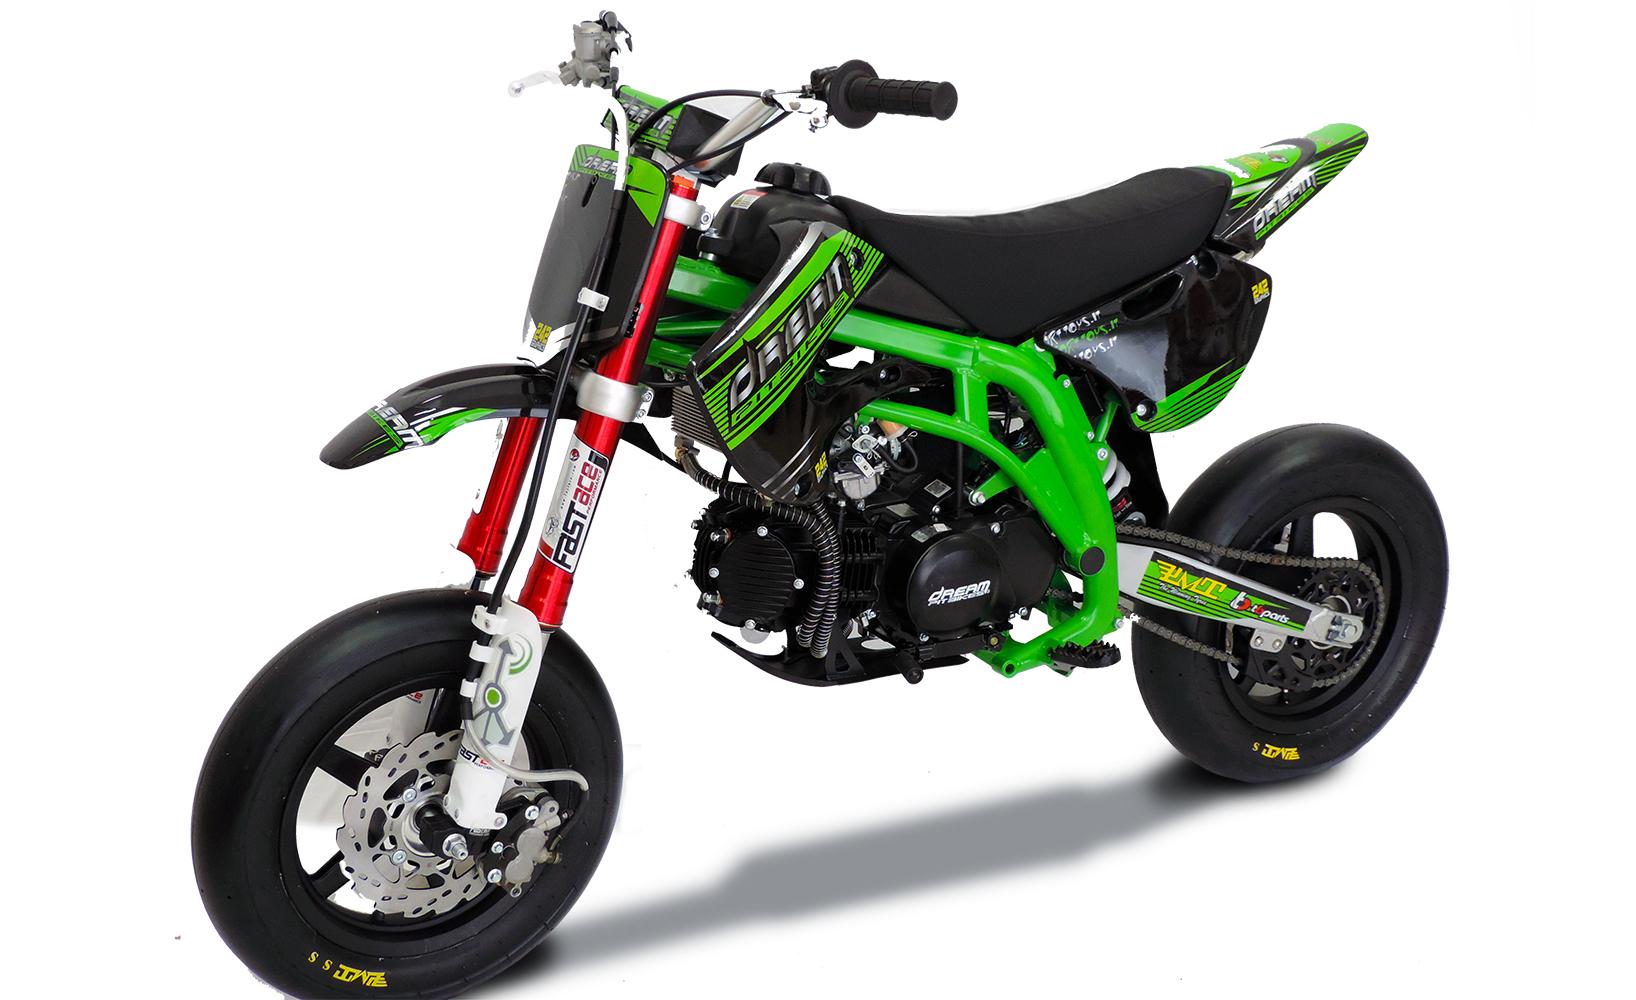 Pit Bike Minimotard Dream Atom Zs177 Pro Limited Edition